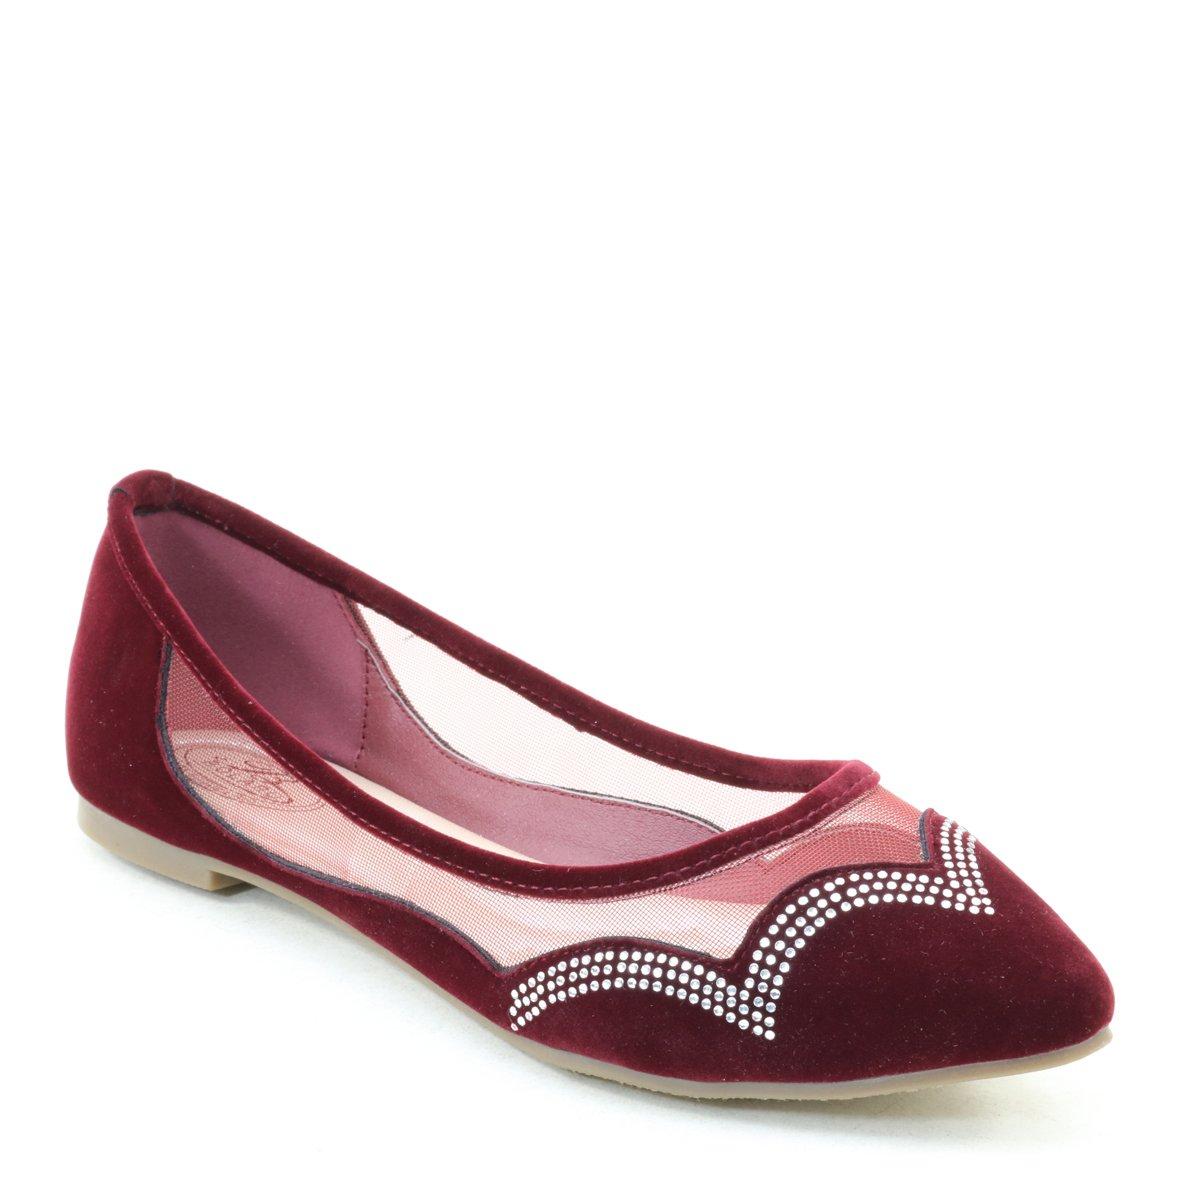 New Brieten Women's Rhinestone Mesh Pointed Toe Flats Comfortable Shoes B06XCS3S3J 7.5 B(M) US|Wine